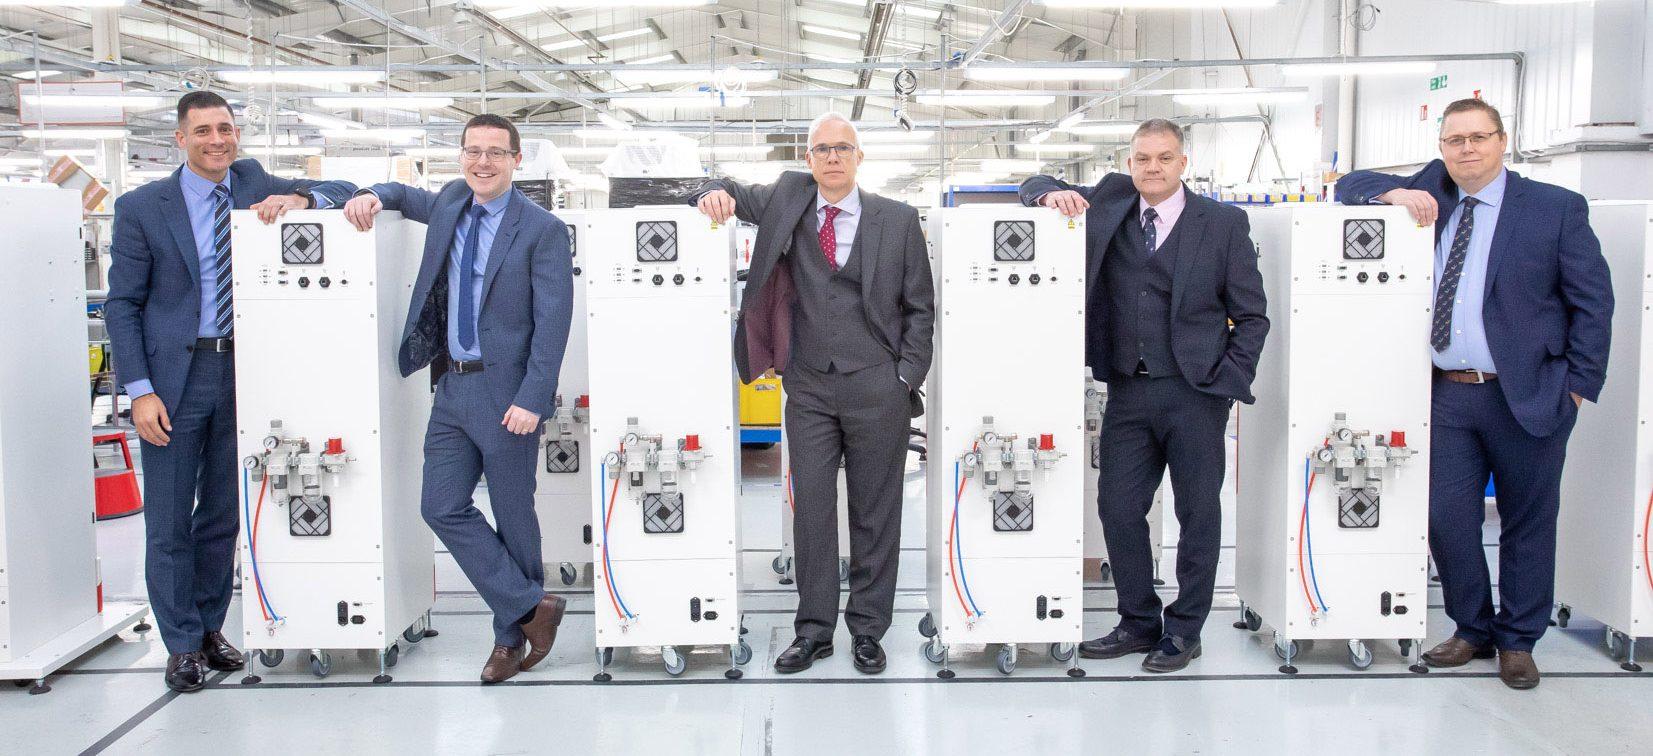 PP Control management team (l-r) sales director Garry Myatt, head of finance Stewart Robertson, CEO Tony Hague, Sean Cayley and Ian Knight